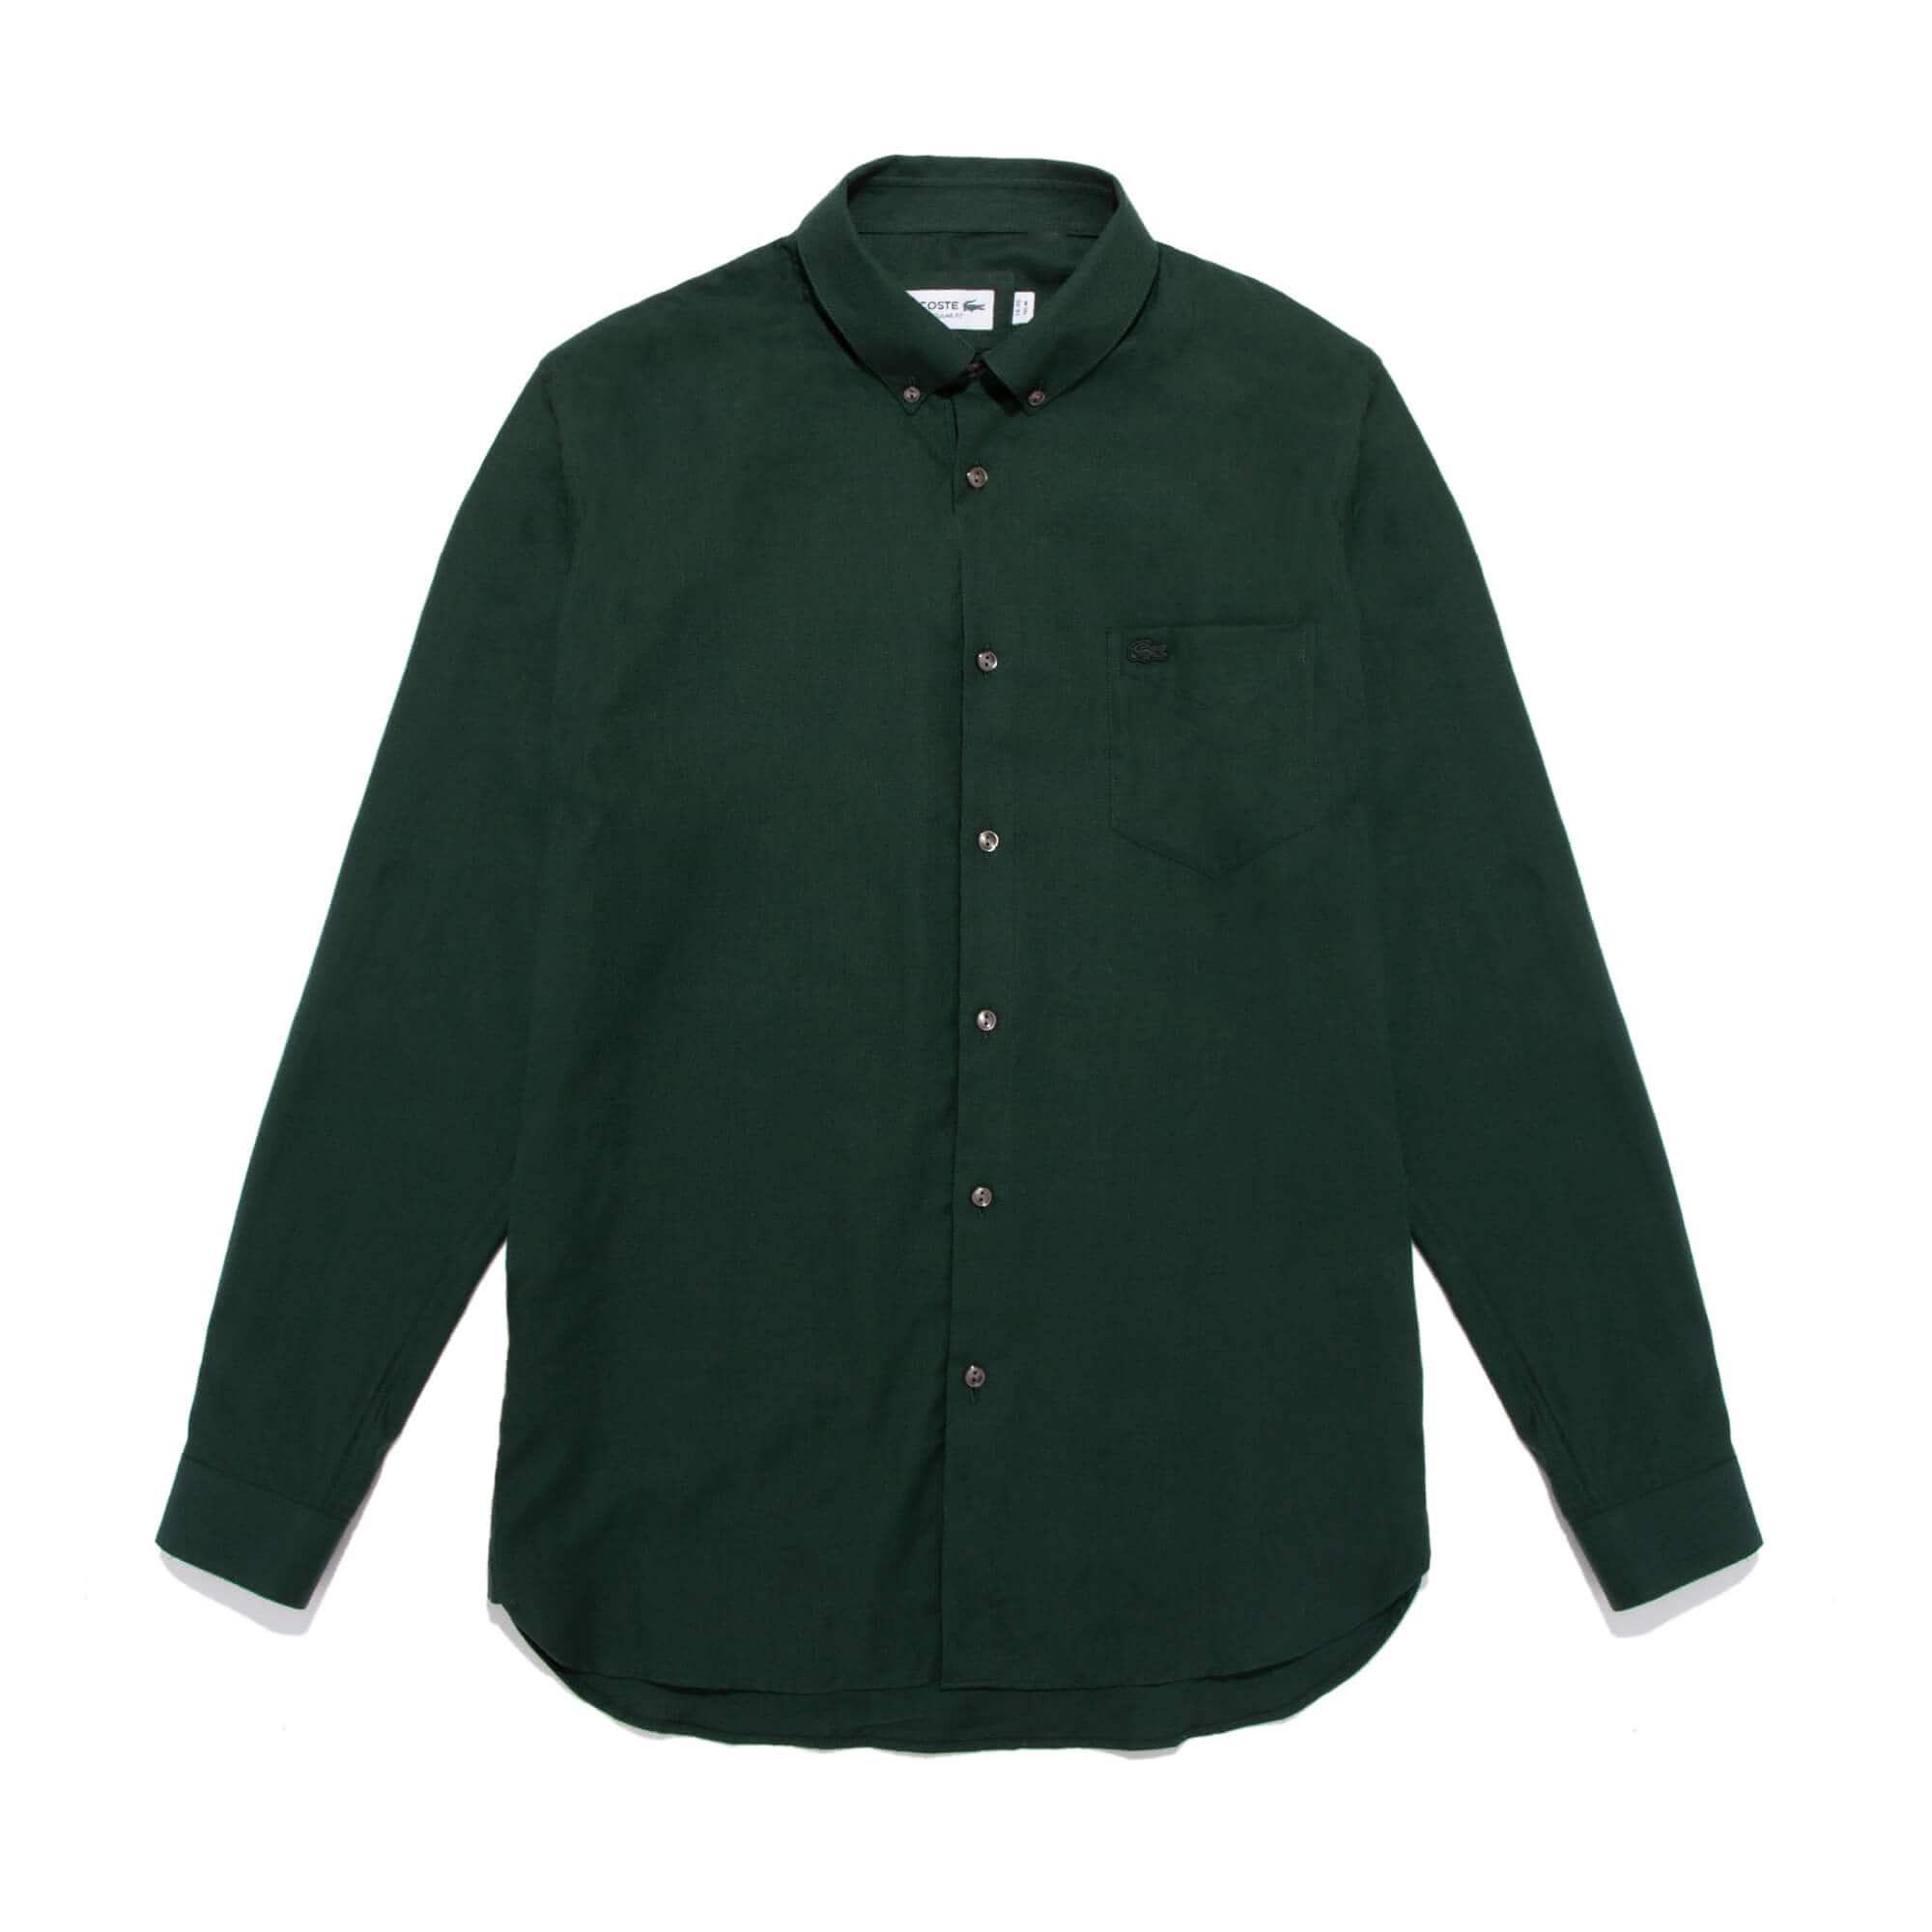 Men's Regular Fit Mother-Of-Pearl Buttoned Wool Blend Shirt